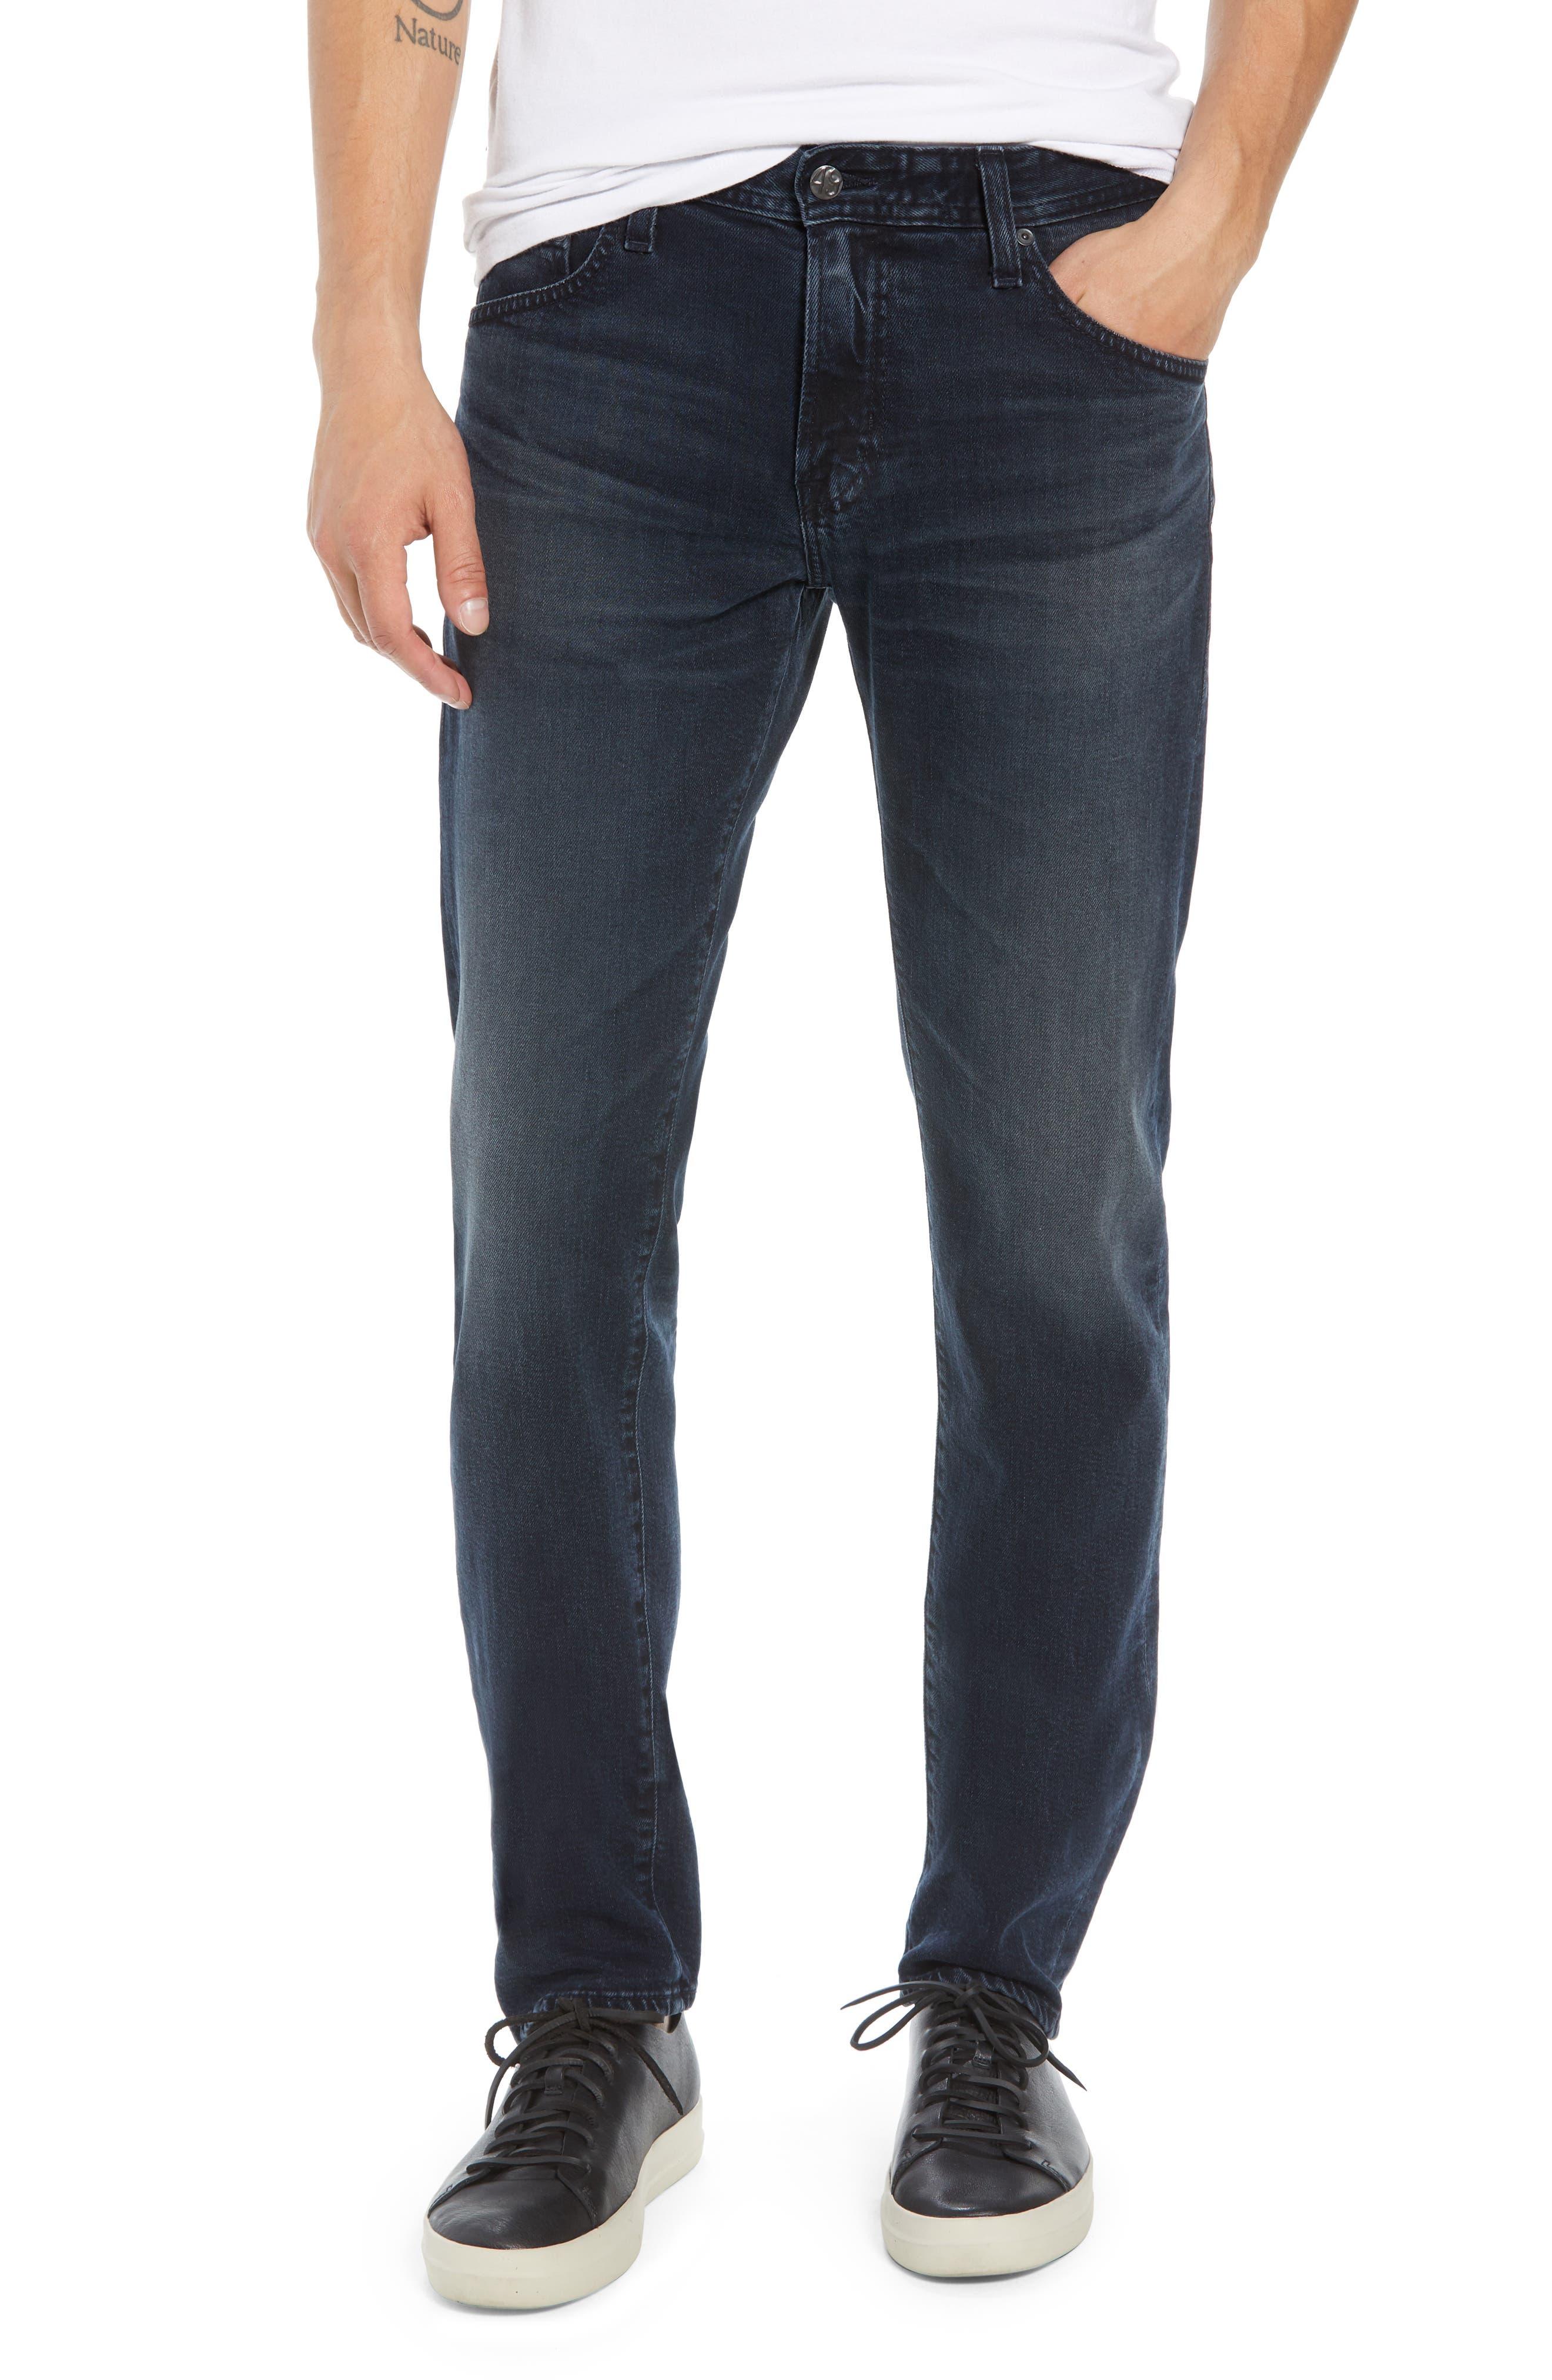 Tellis Slim Fit Jeans,                         Main,                         color, 2 YEARS RUMBLE